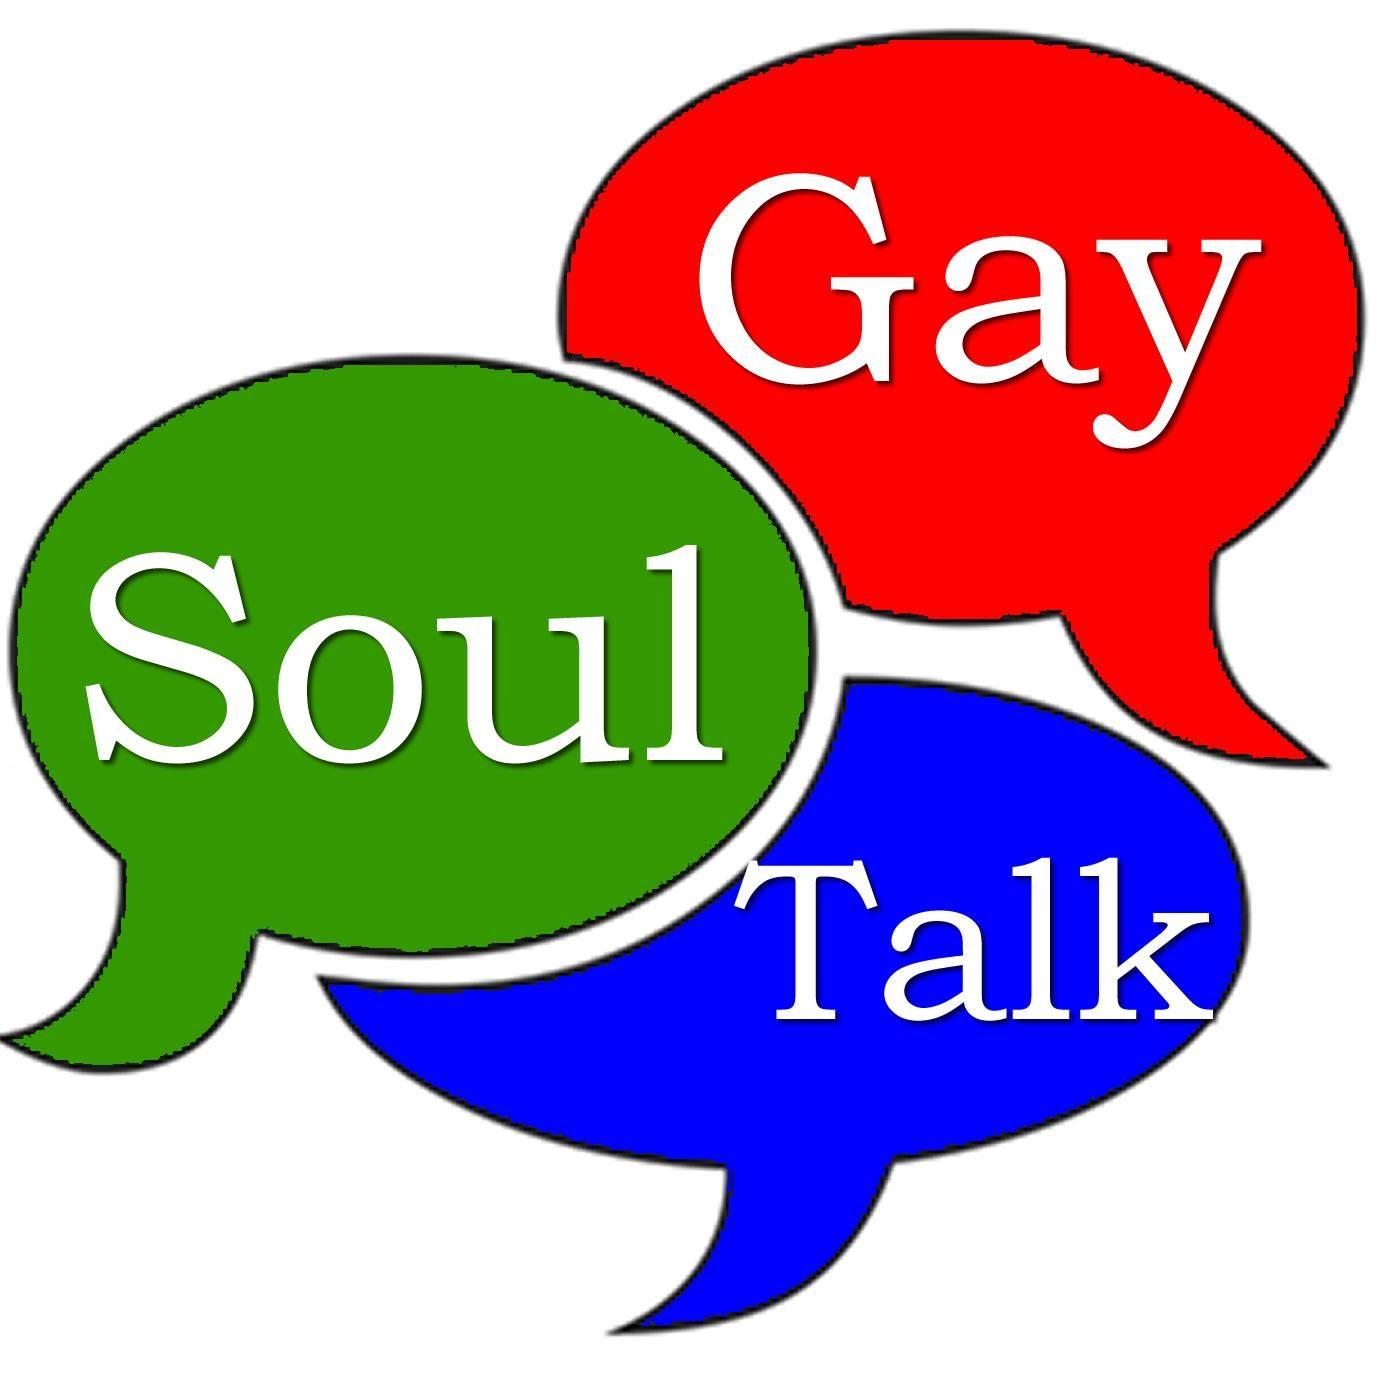 Gay Soul Talk